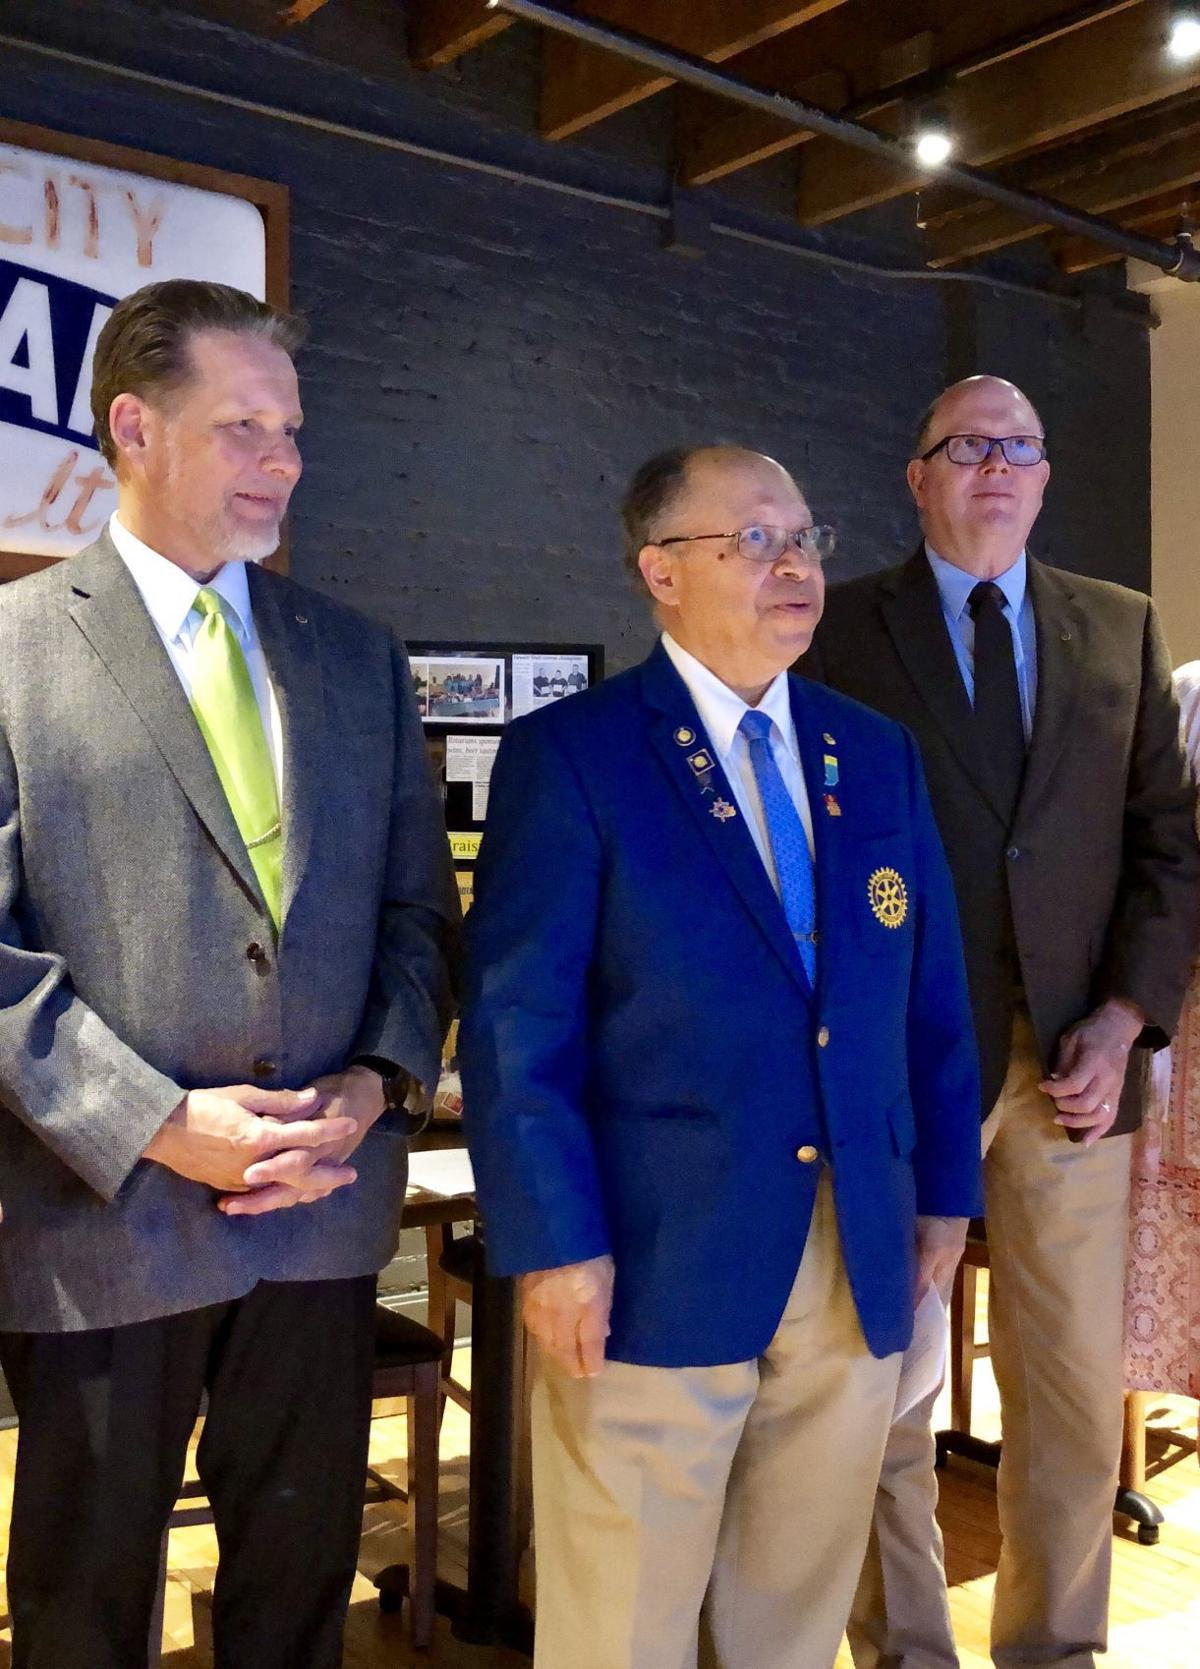 New Auburn Rotary members